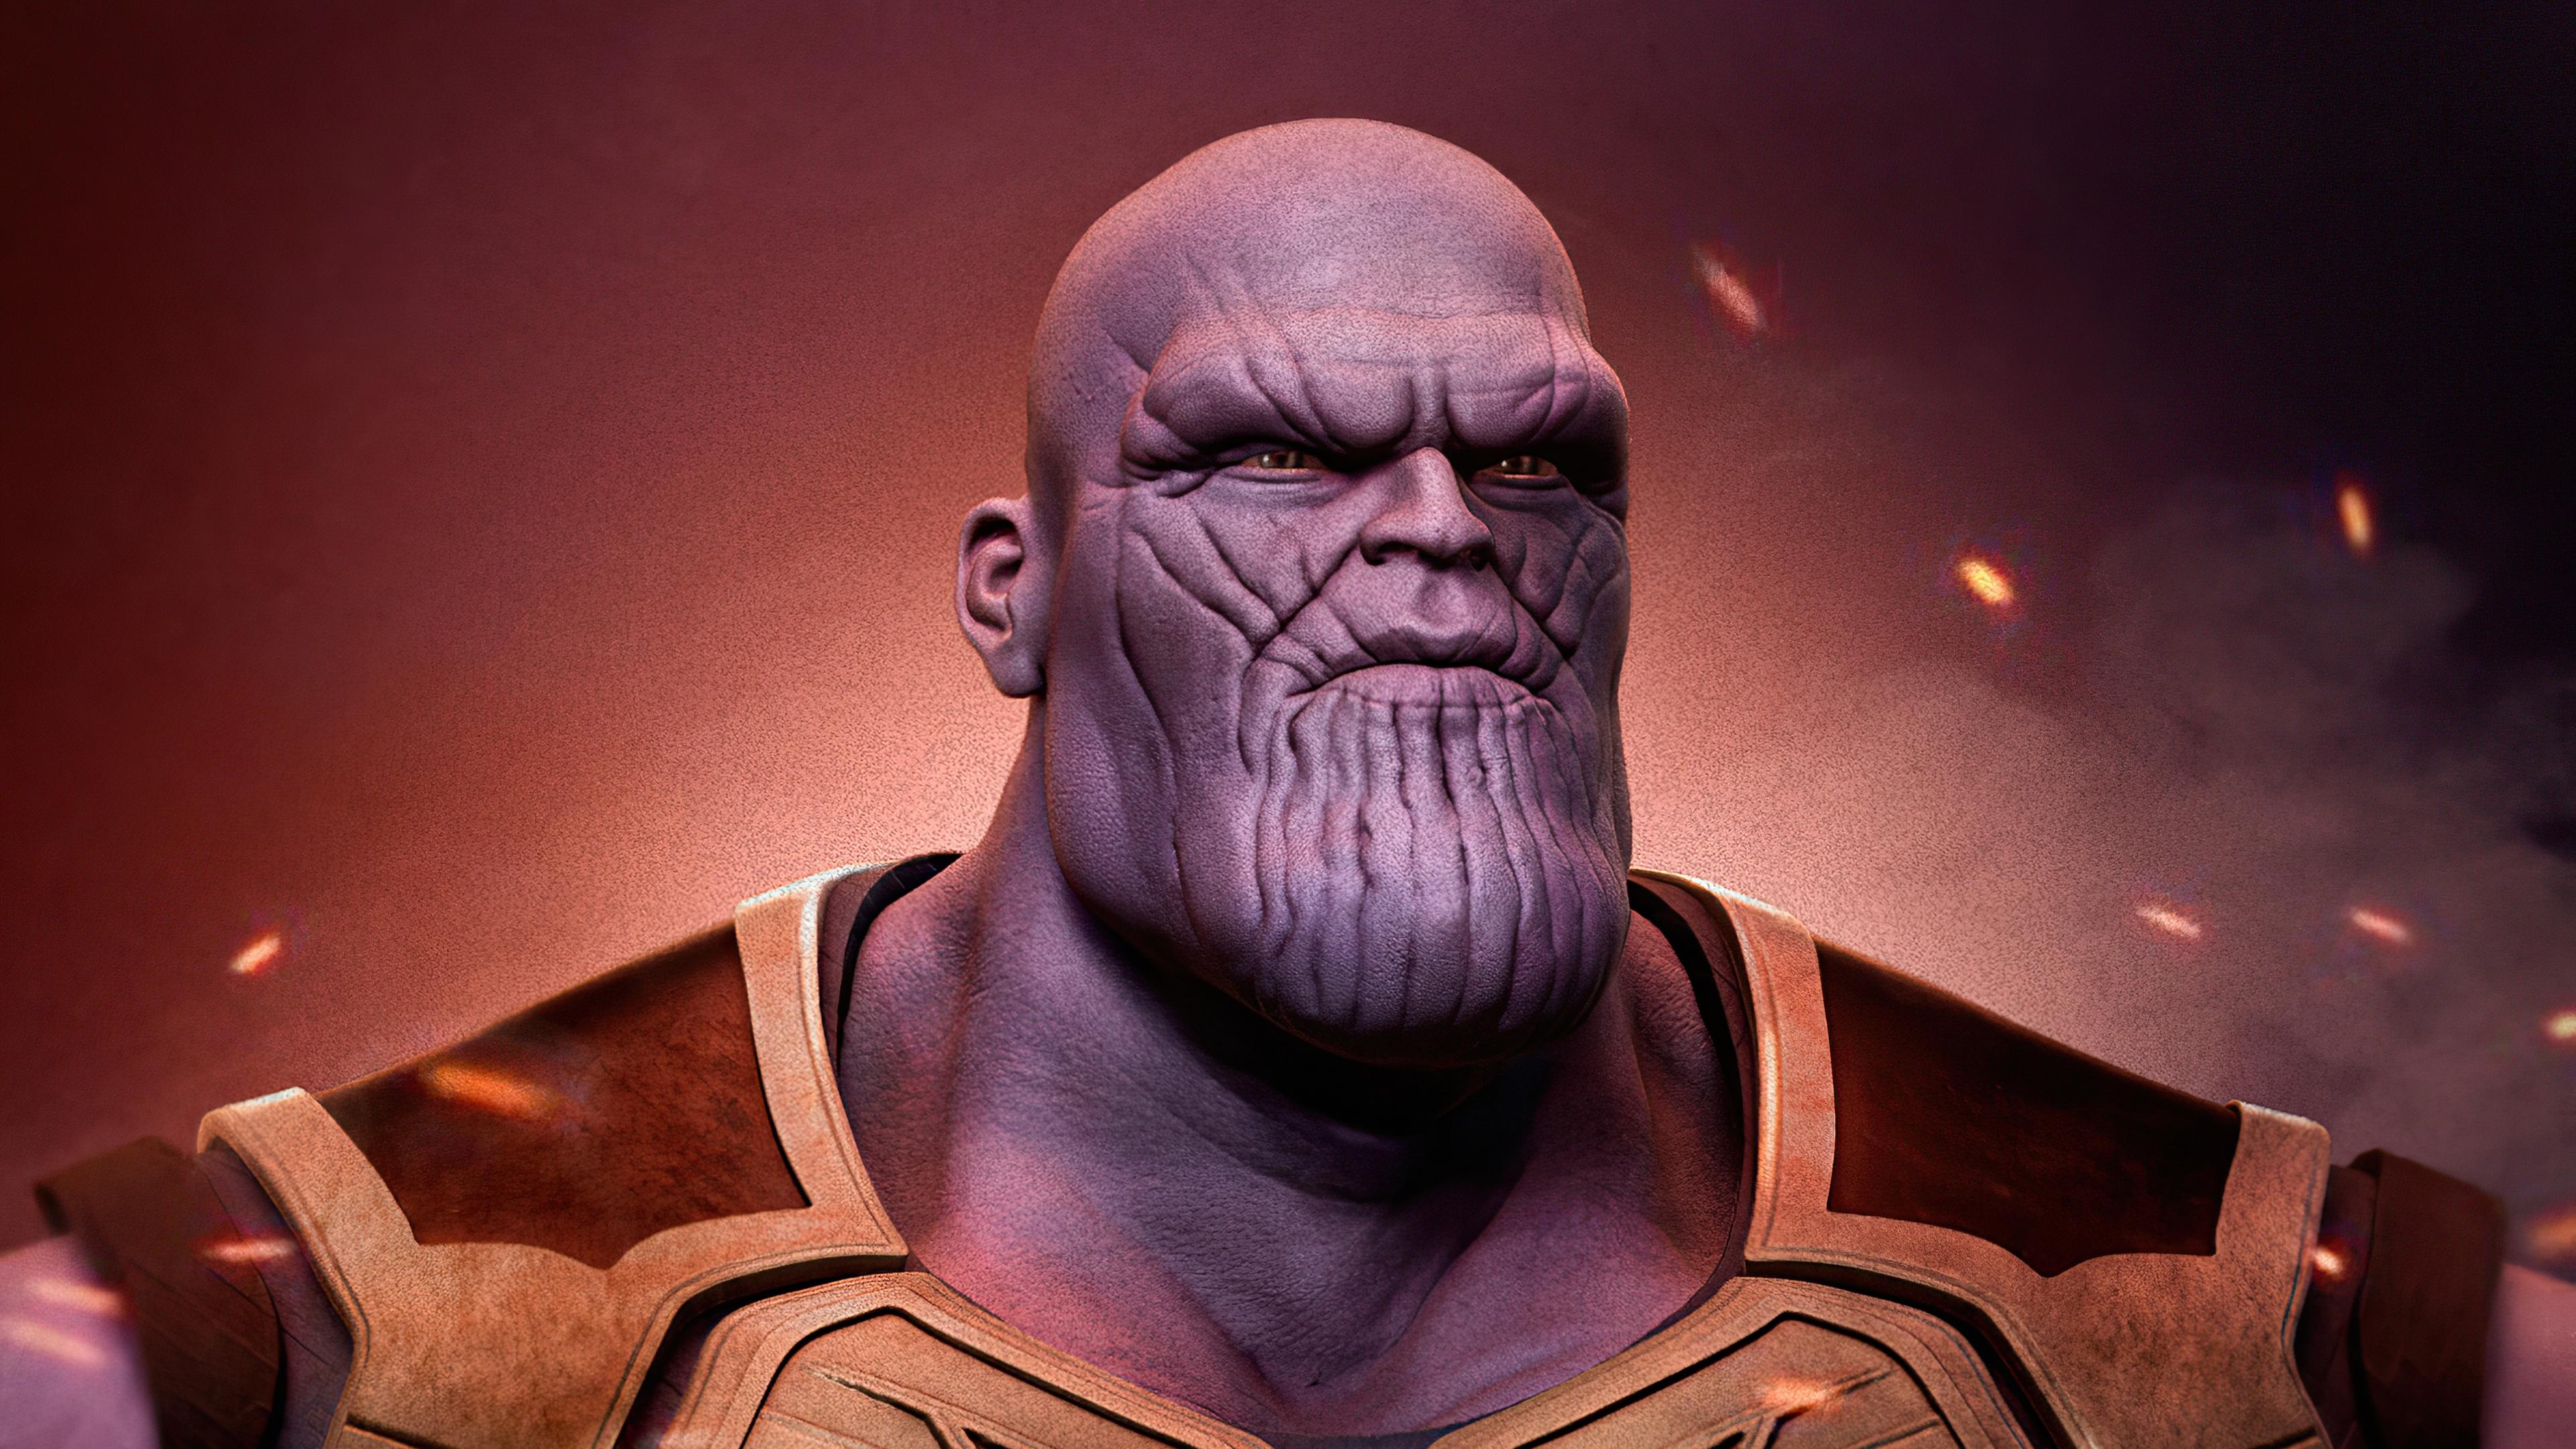 thanos the mad titan fanart 4k 1616956547 - Thanos The Mad Titan Fanart 4k - Thanos The Mad Titan Fanart 4k wallpapers